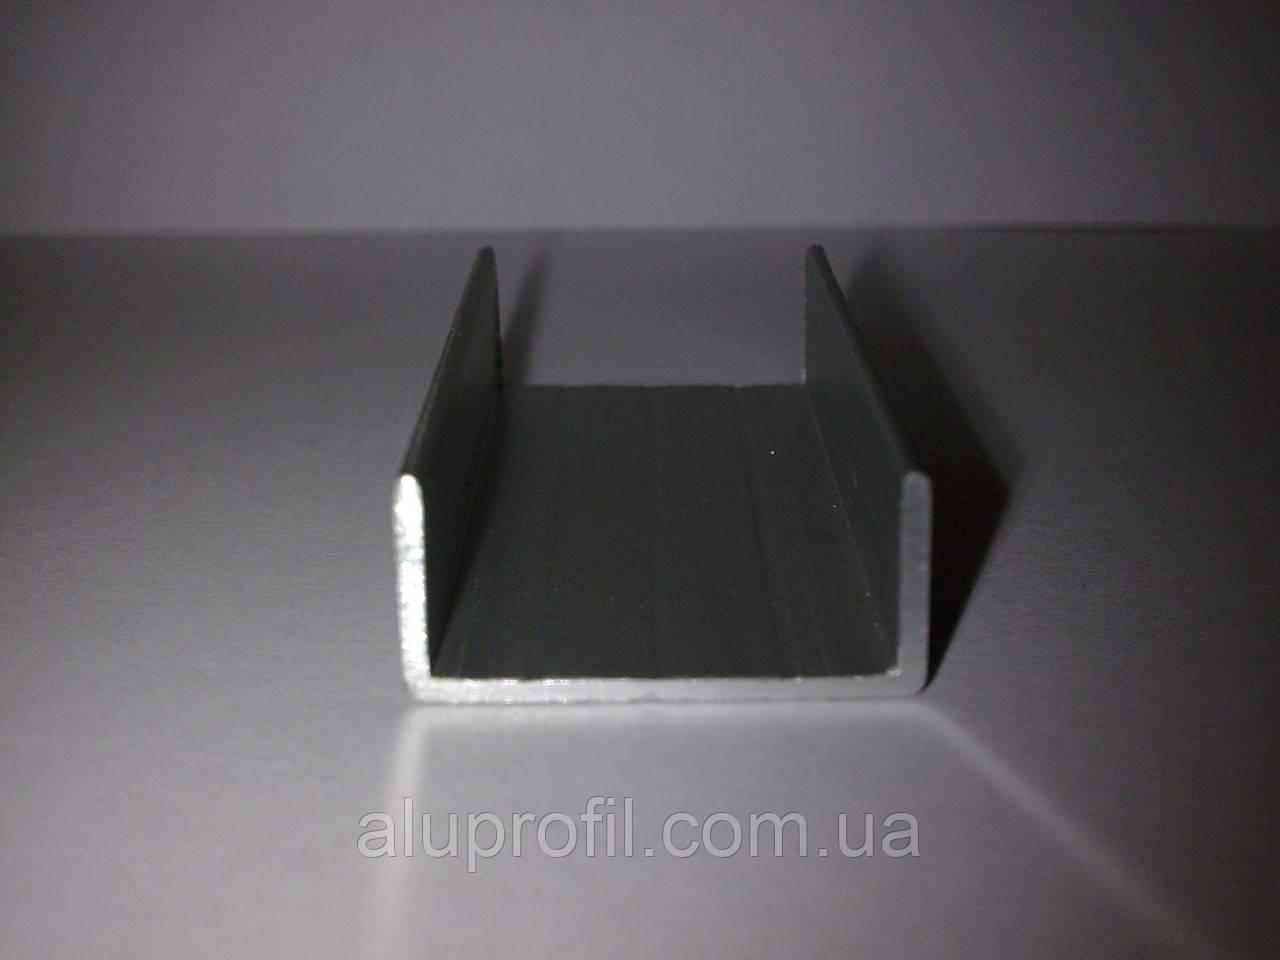 Алюминиевый профиль — п-образный алюминиевый профиль (швеллер) 31х13x1,5 AS